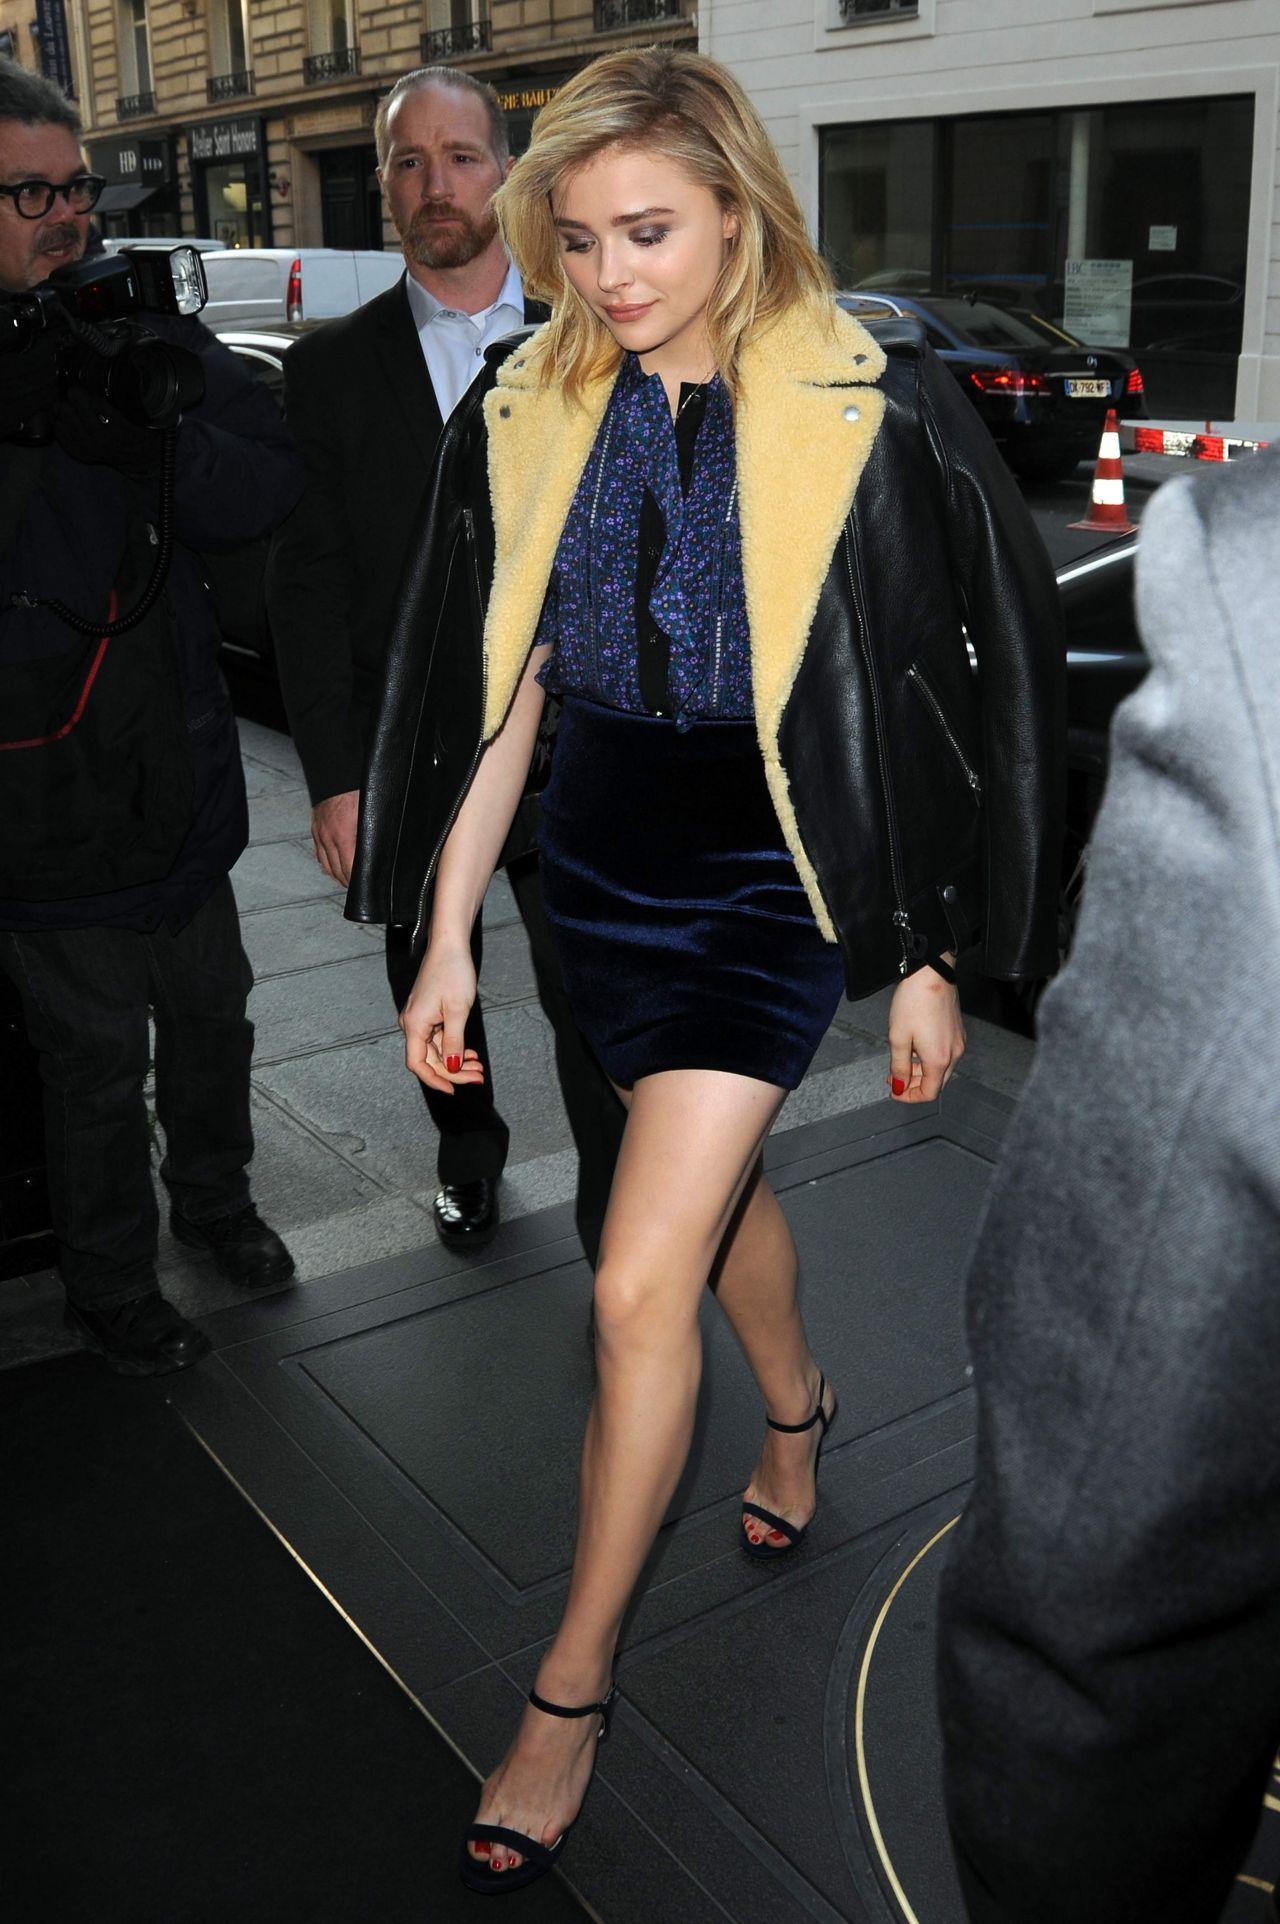 chloe-moretz-leggy-in-mini-skirt-at-hotel-le-bristol-in-paris-1-20-2016-9